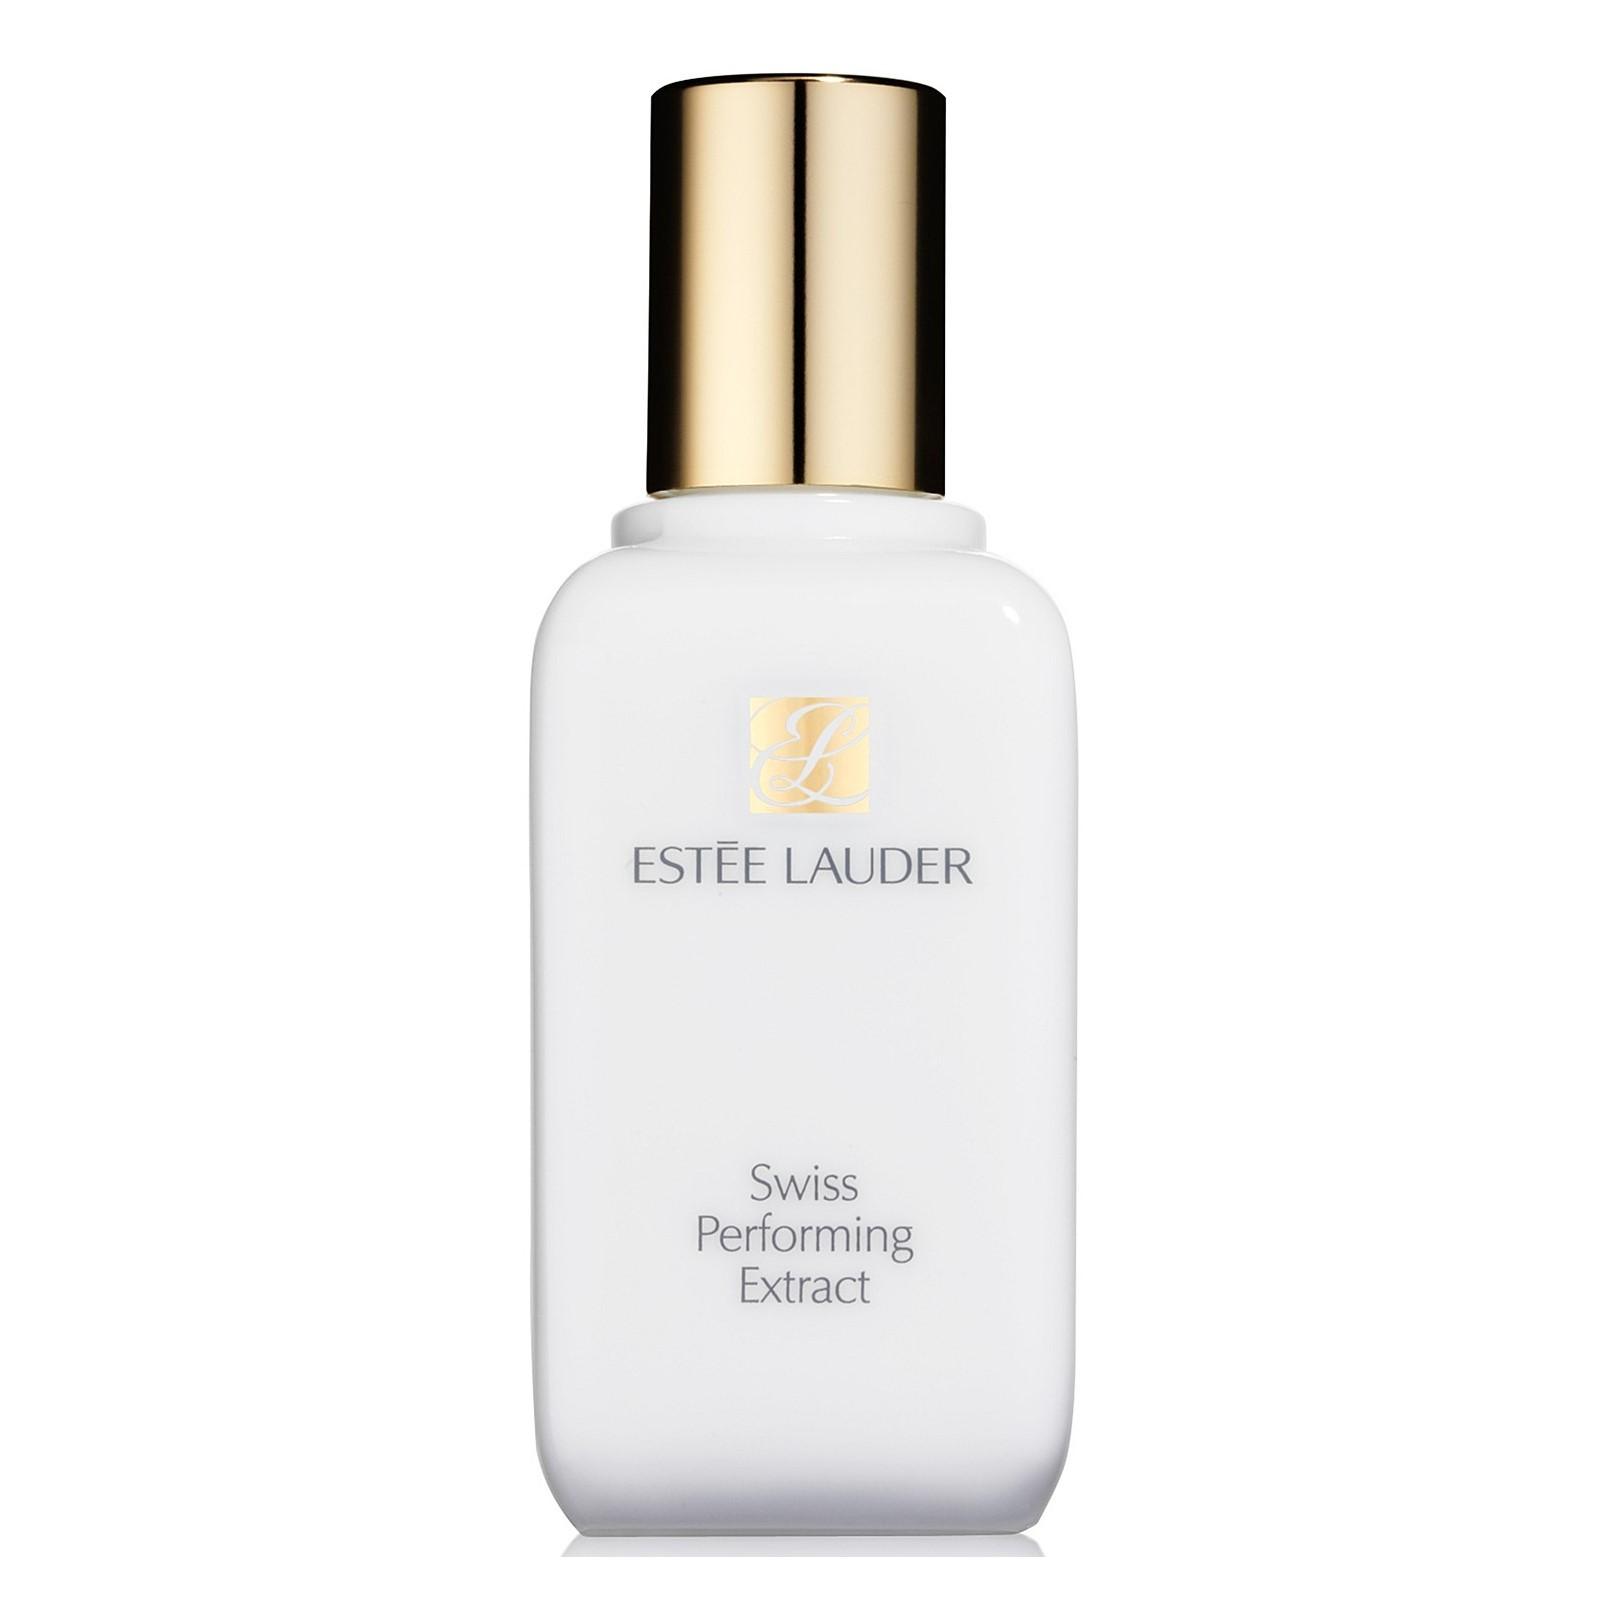 Estee Lauder Swiss Performing Extract, 3.4 oz